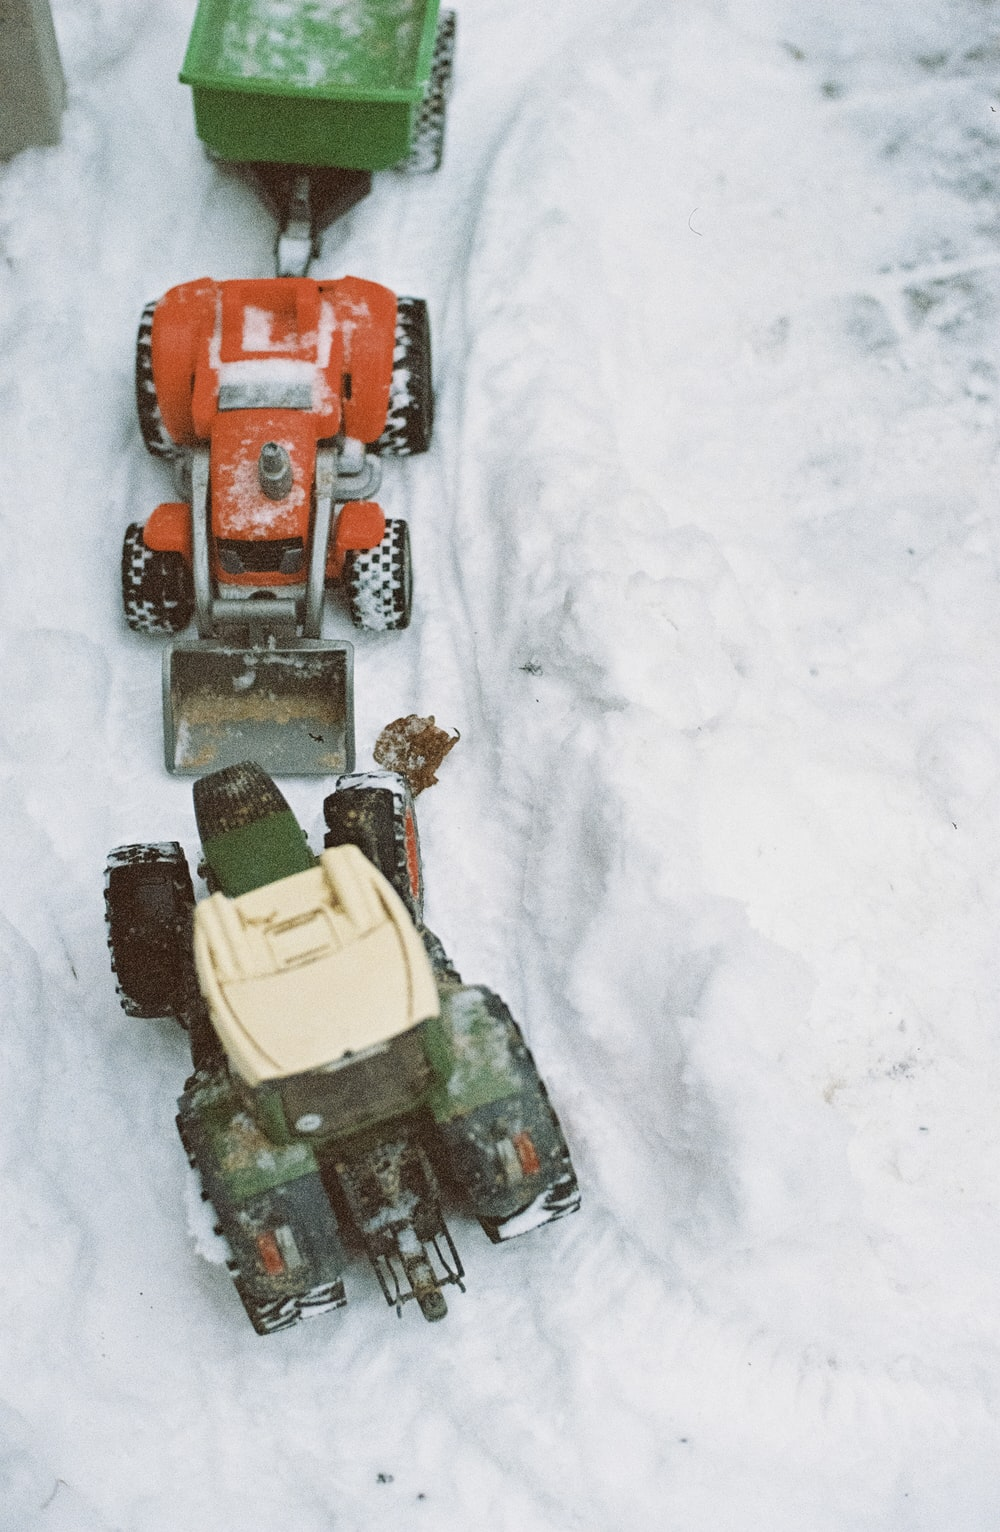 three red vehicle toys on snow